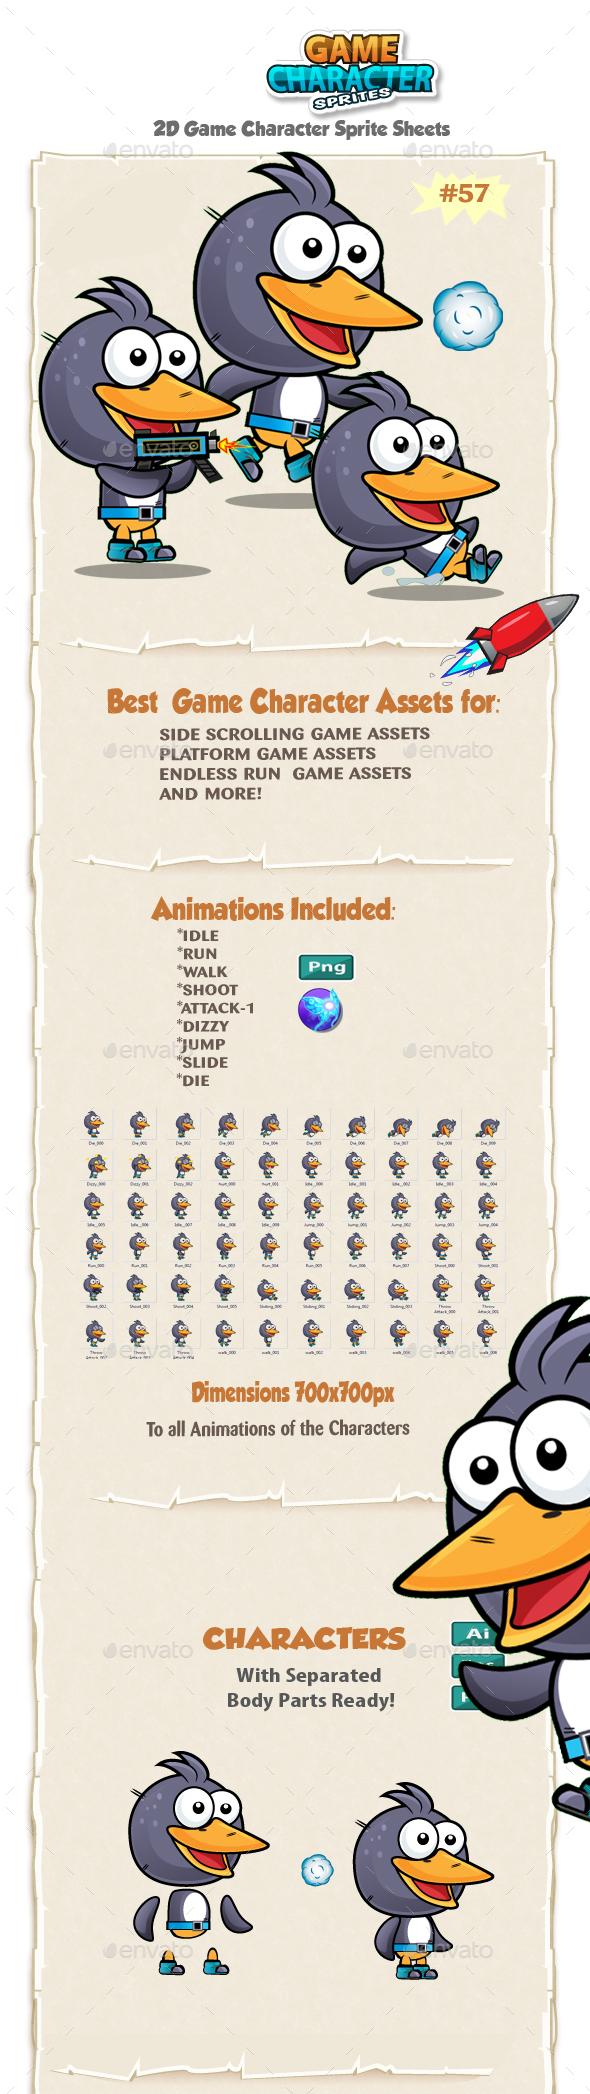 Penguin 2D Game Character Sprites 55 - Sprites Game Assets